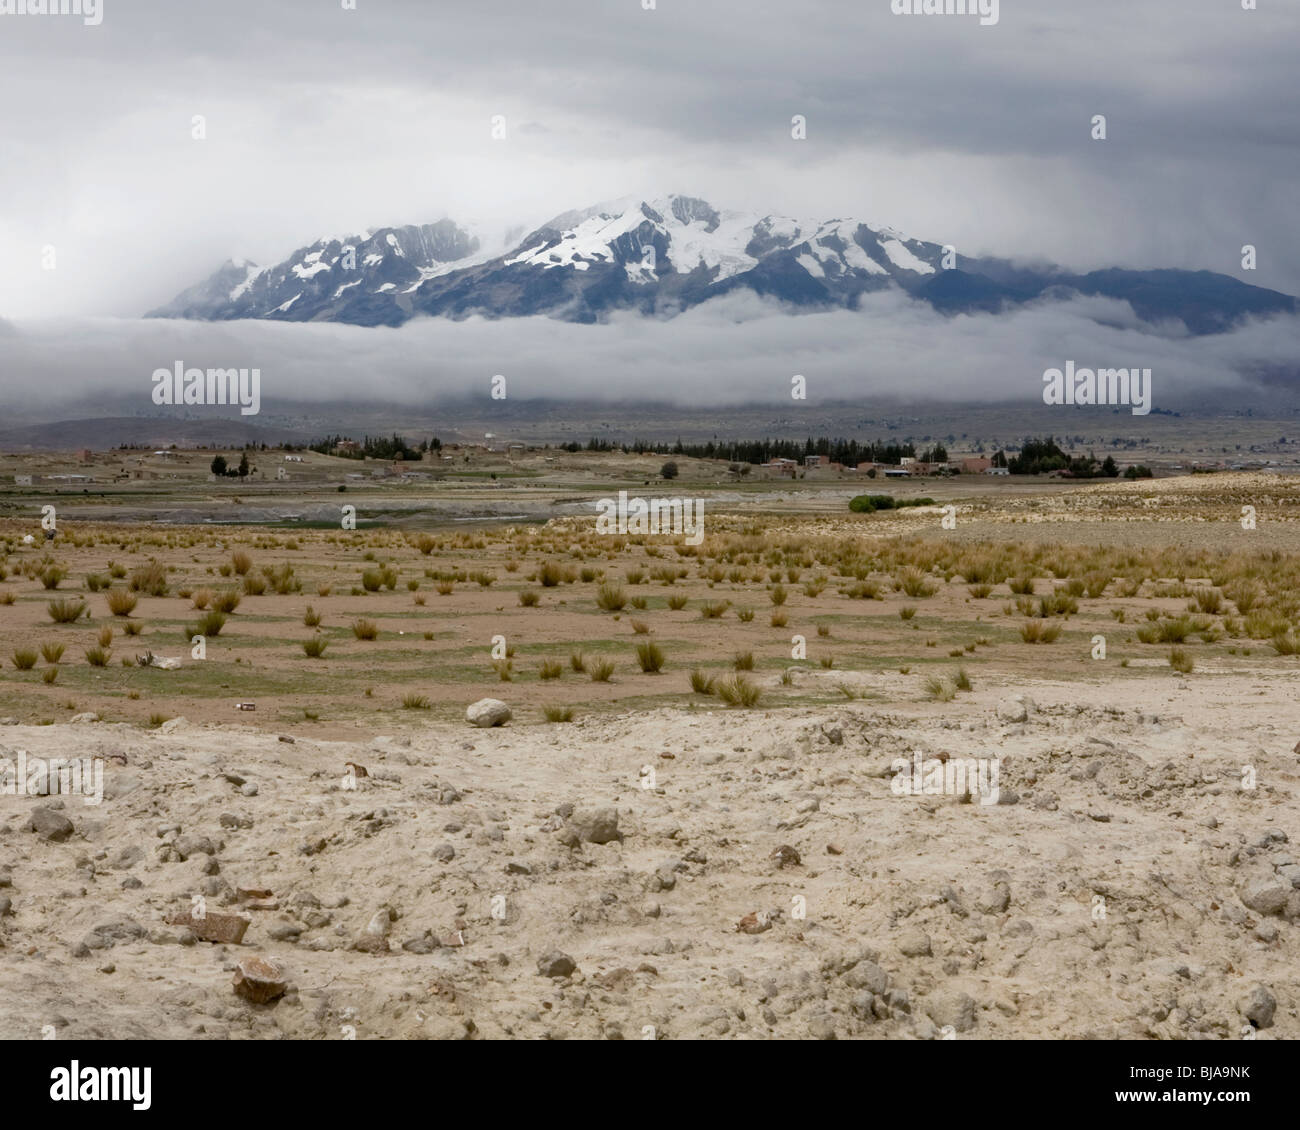 Mountain wrapped in fog, mount Ancohuma, Bolivia - Stock Image